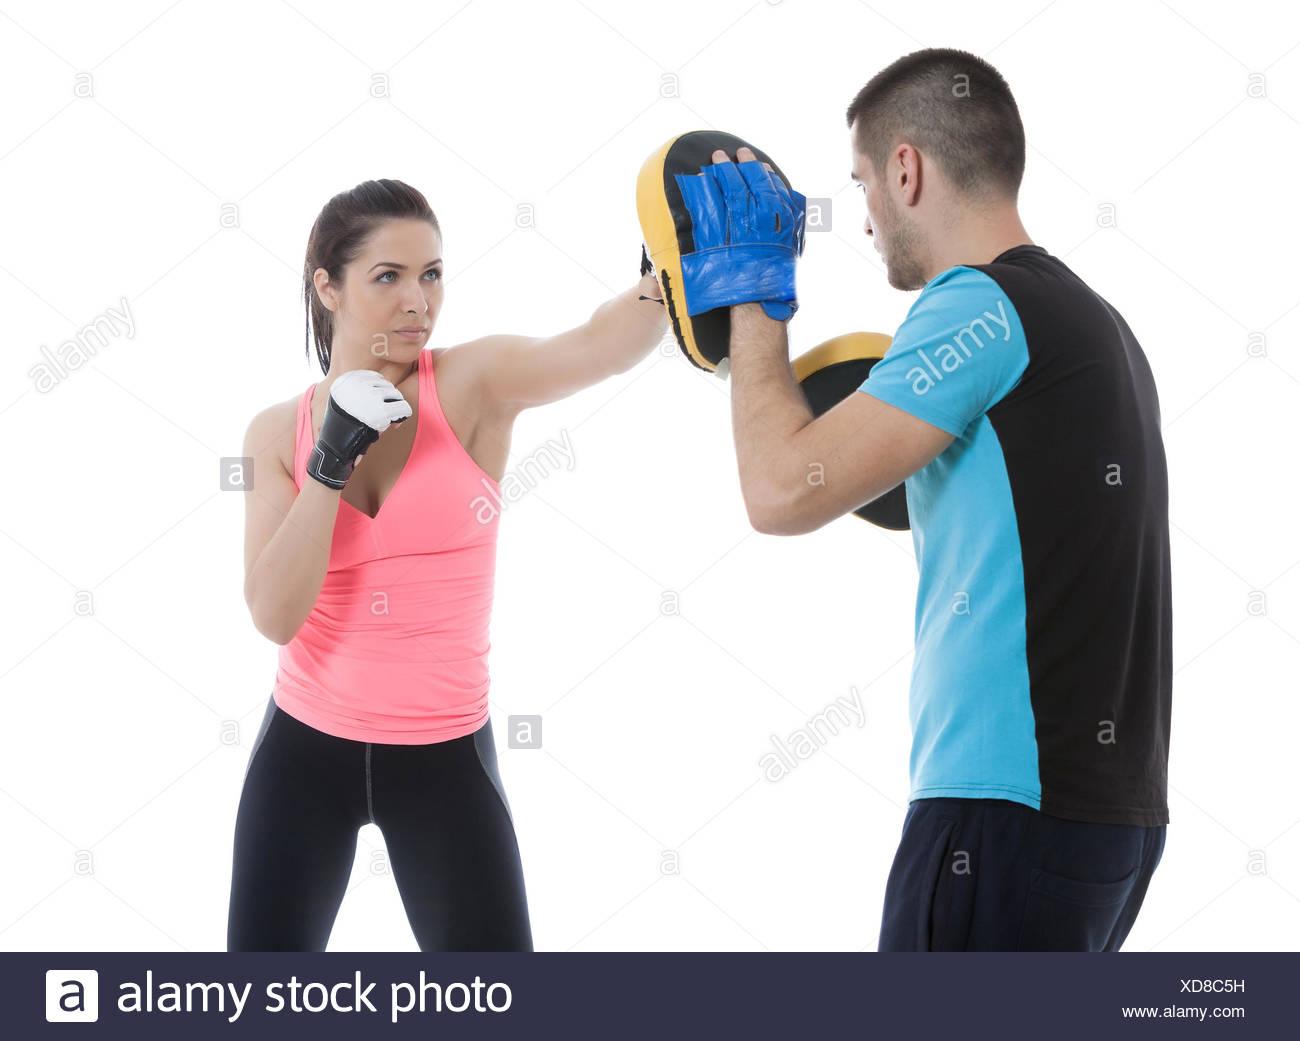 Exercice d'entraînement de boxe Photo Stock